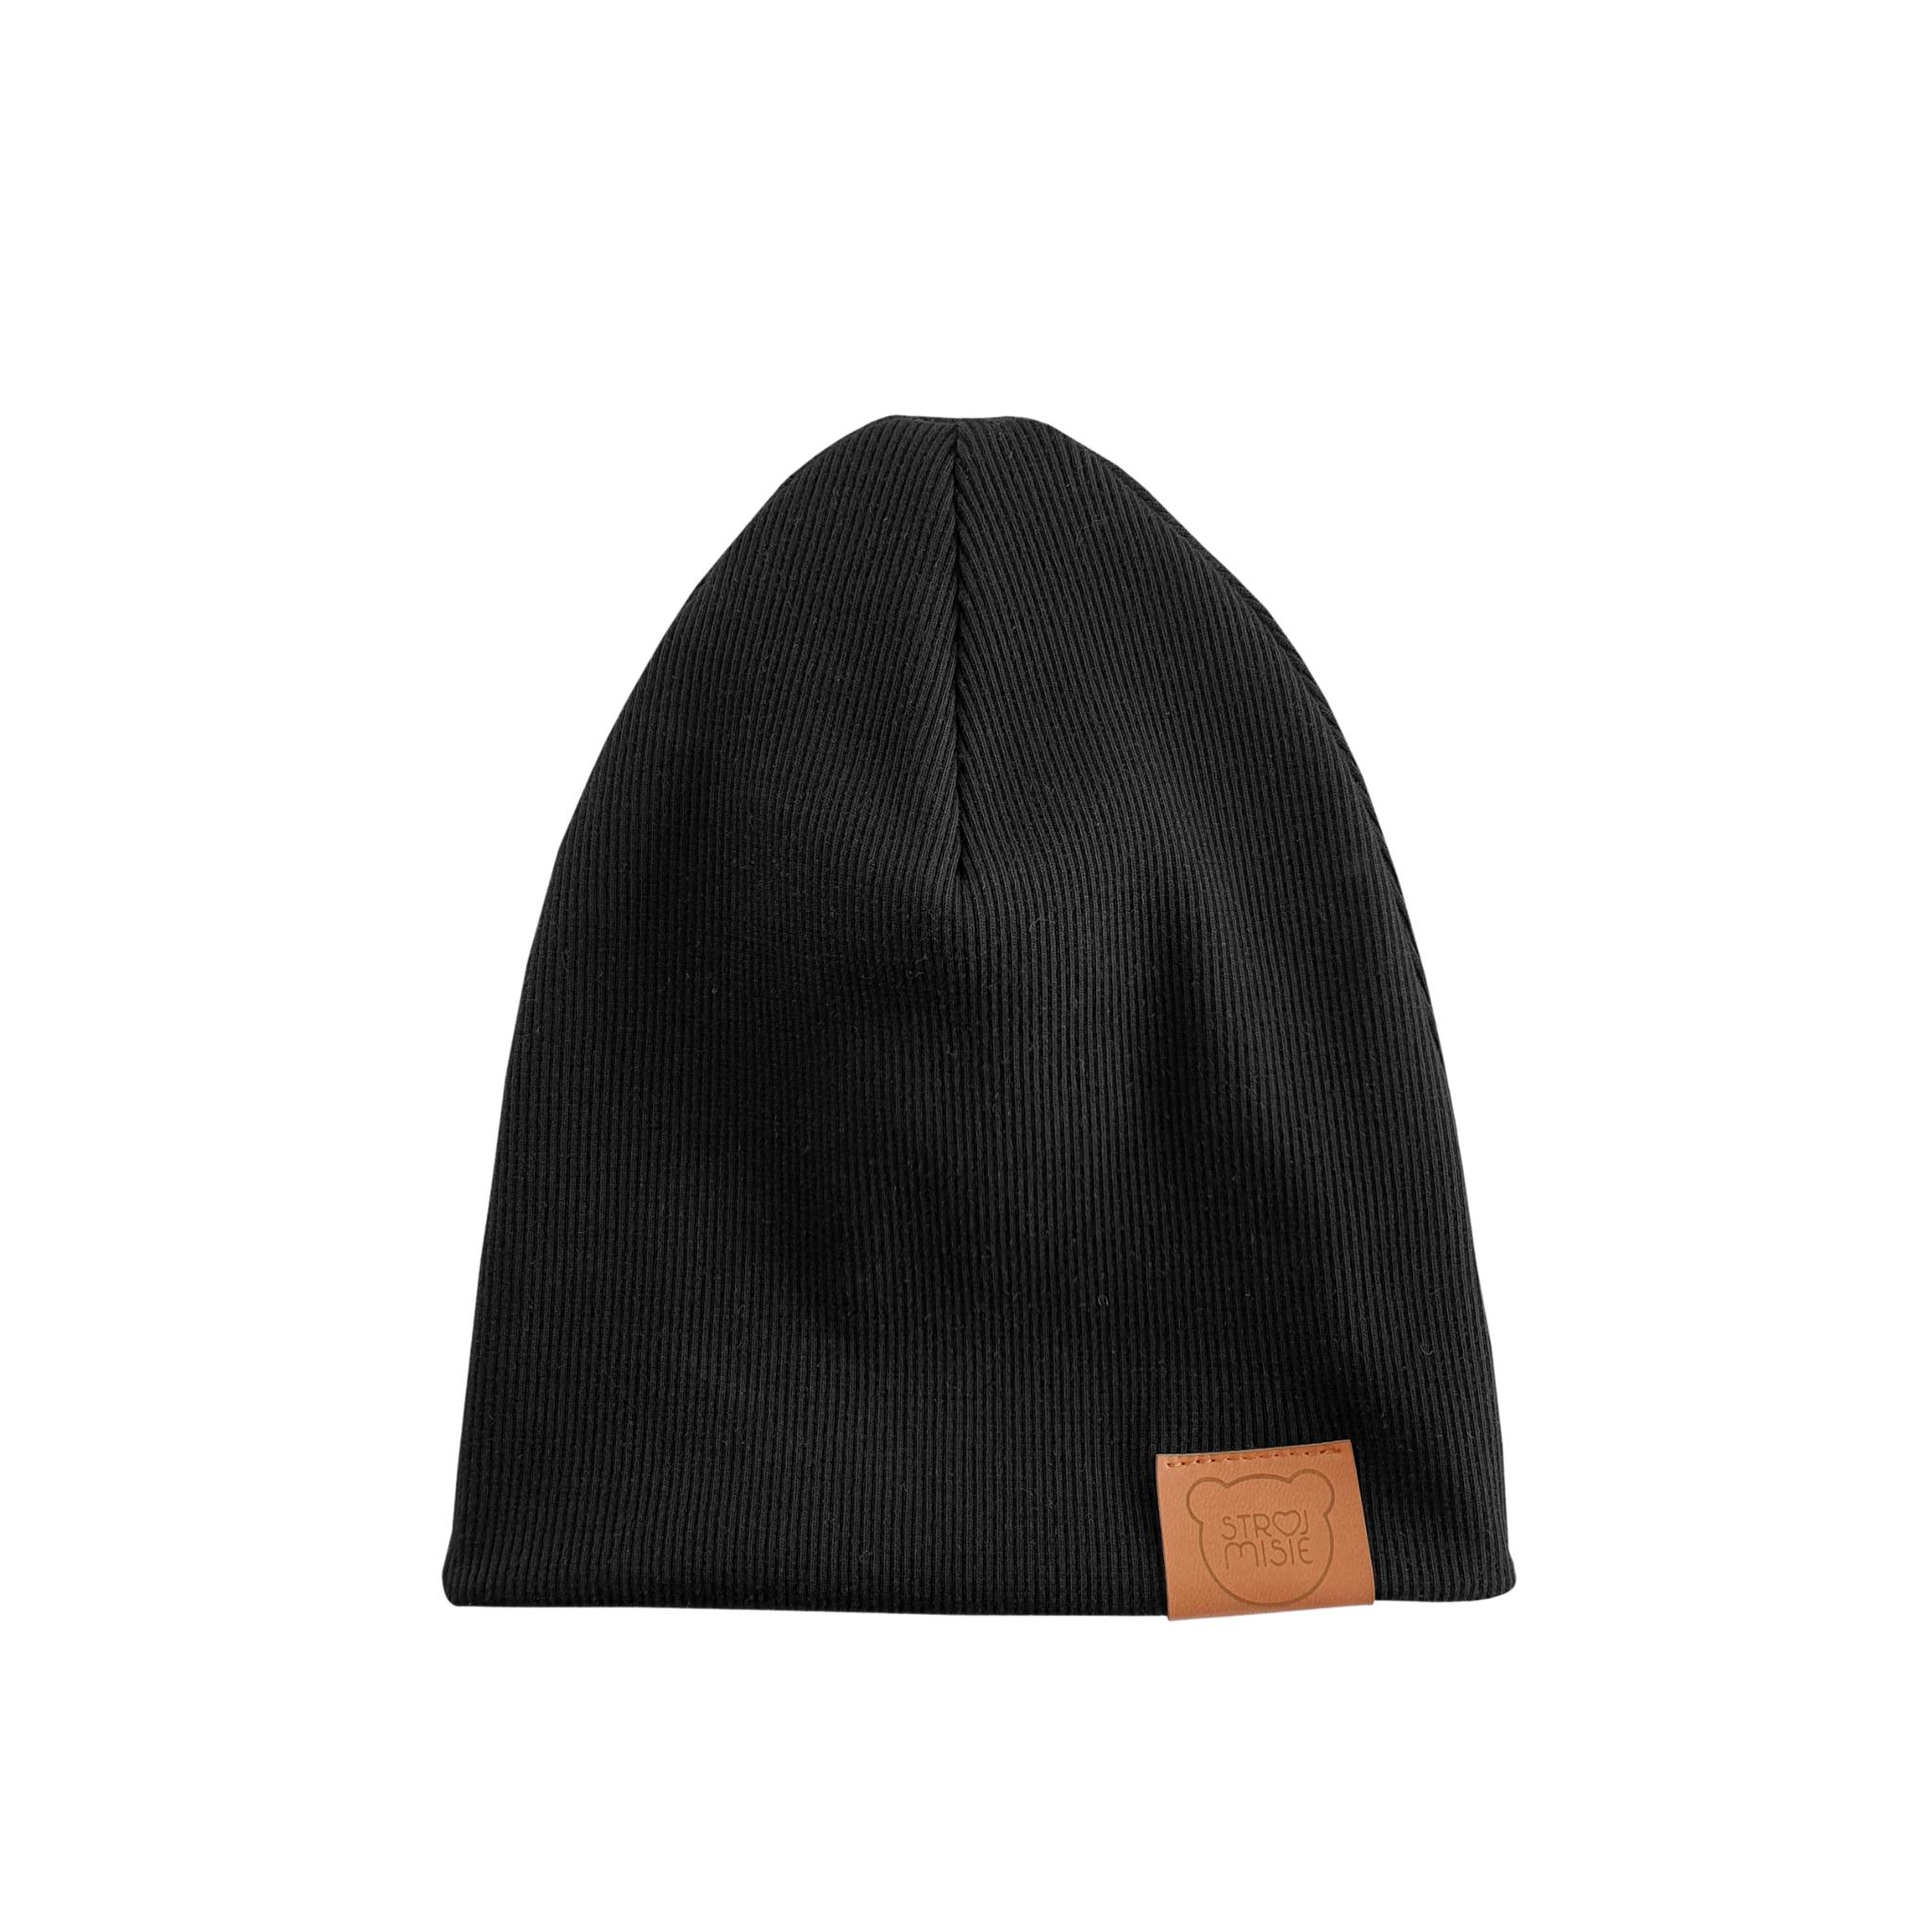 Strojmisie BLACK HAT | KIDS HAT BLACK | BABY HAT BLACK